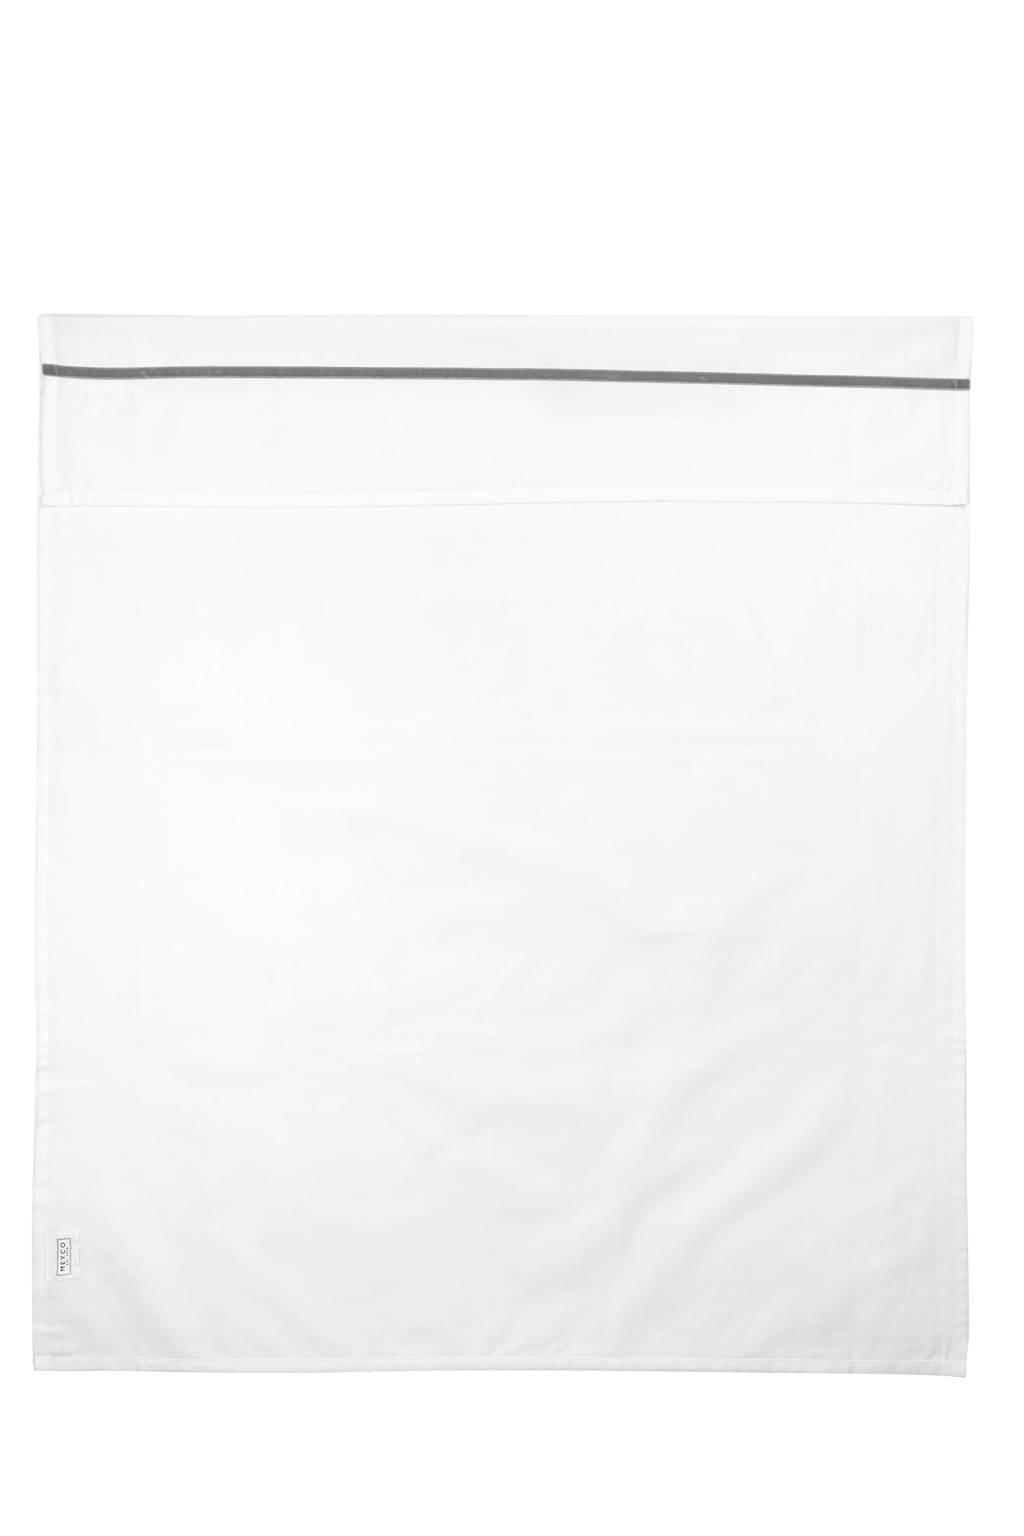 Meyco baby ledikantlaken Bies 100x150 cm grijs, Wit/grijs